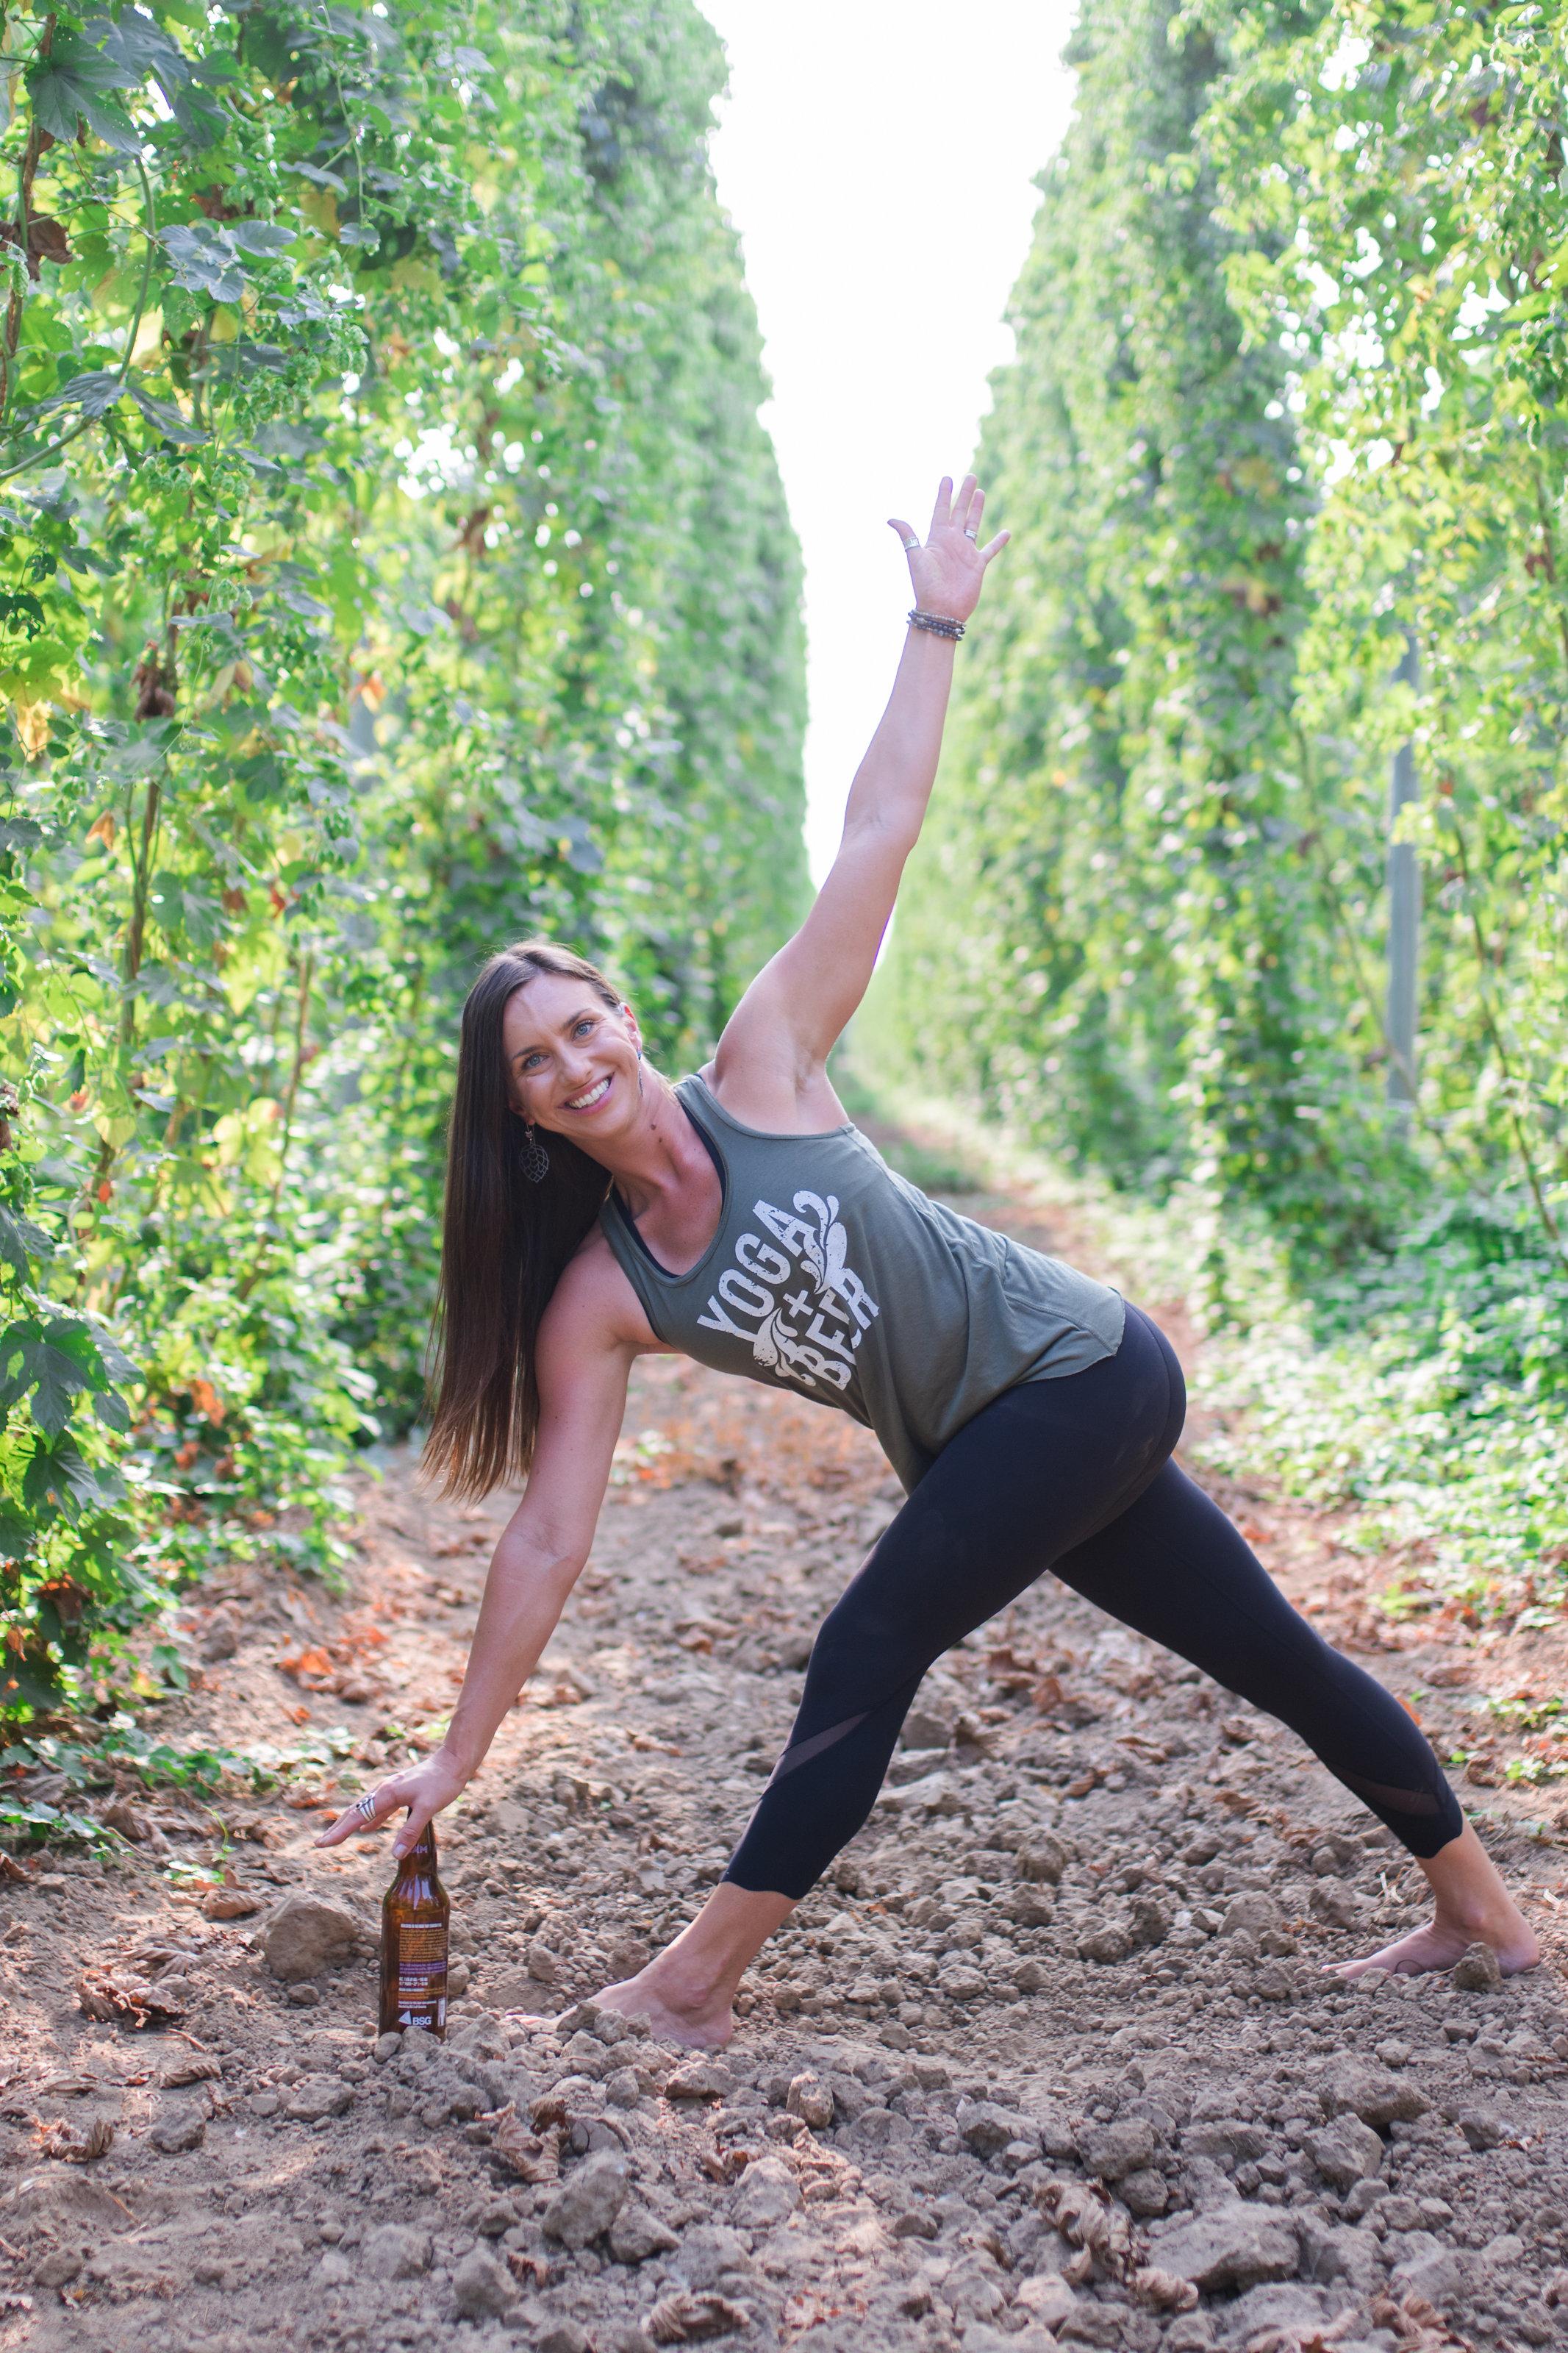 YOGA + BEER. Mikki Trowbridge Yoga. yOGA + bEER. YOGA CLASSES IN OREGON and washington BREWERIES. ALL LEVELS YOGA CLASSES IN SALEM, PORTLAND, ALBANY, SILVERTON, newport, tualatin, woodinville and vancouver.